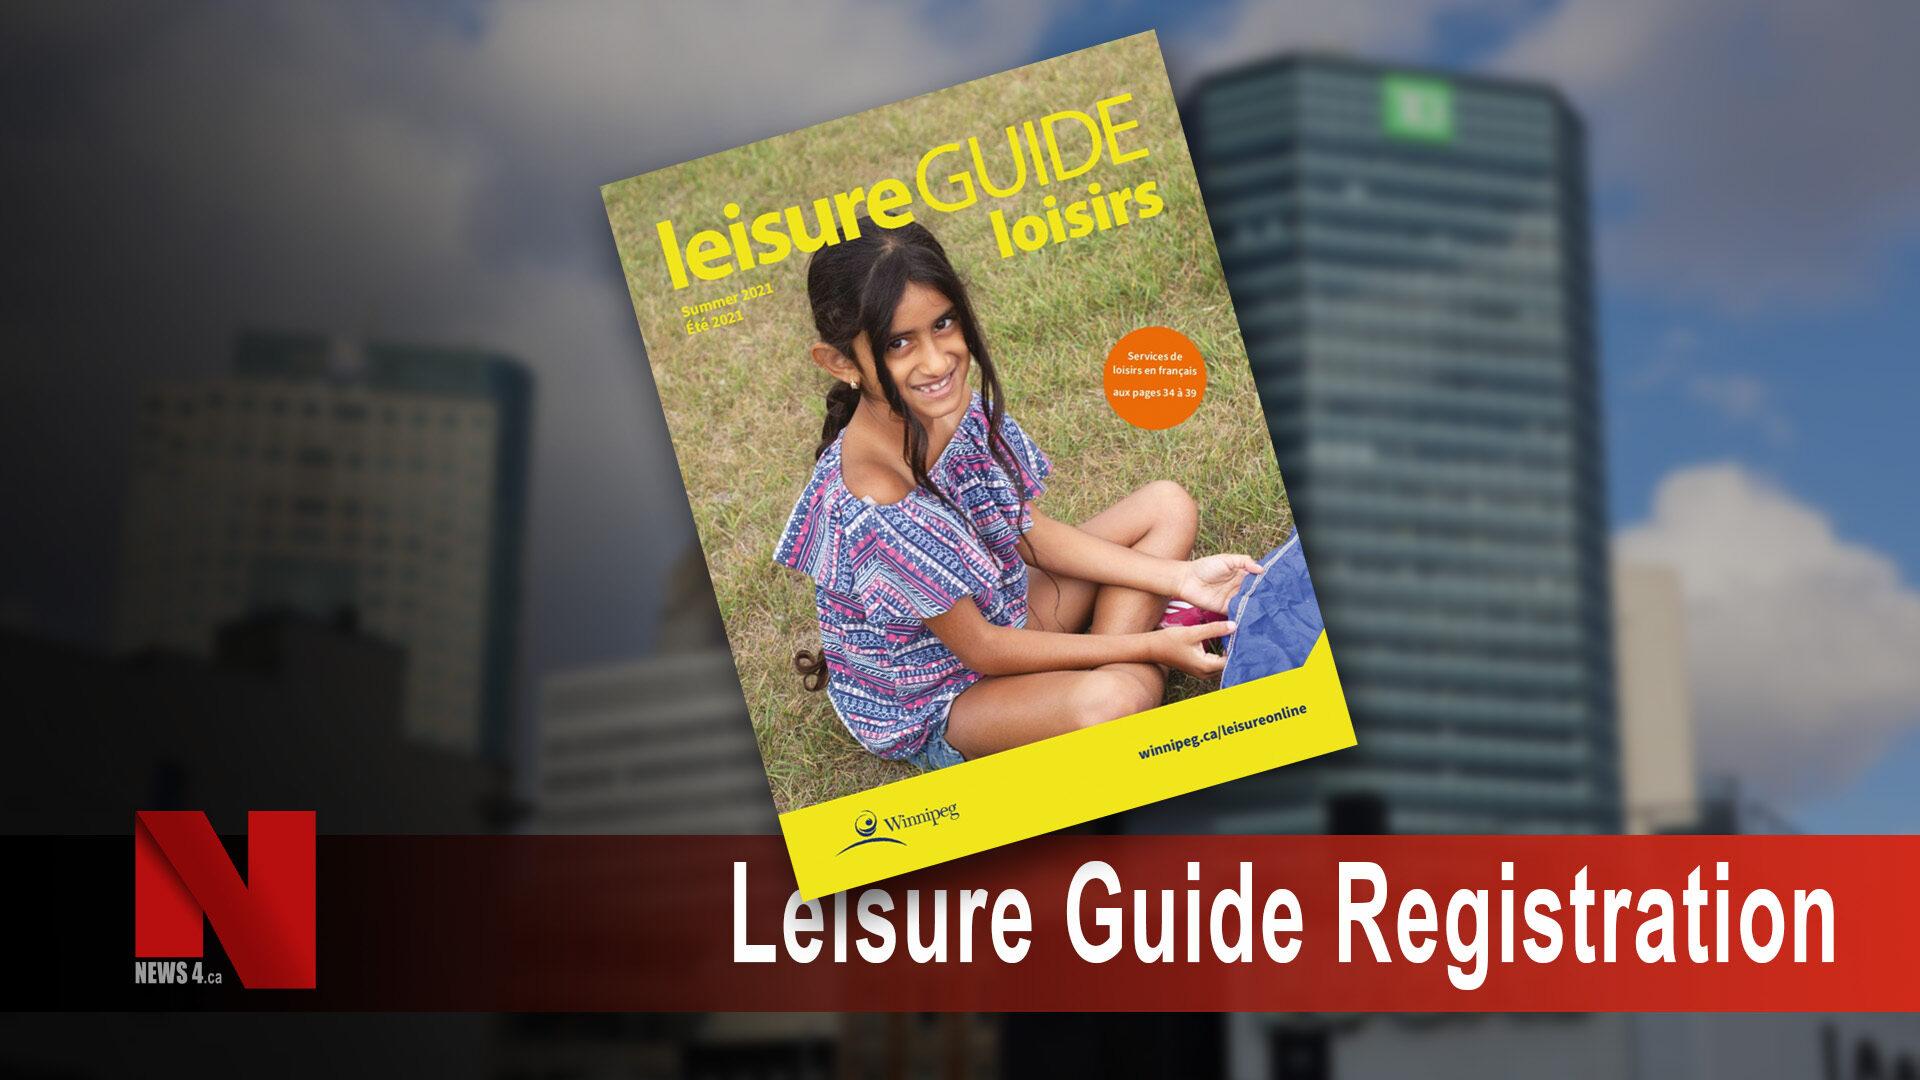 Leisure Guide Registration